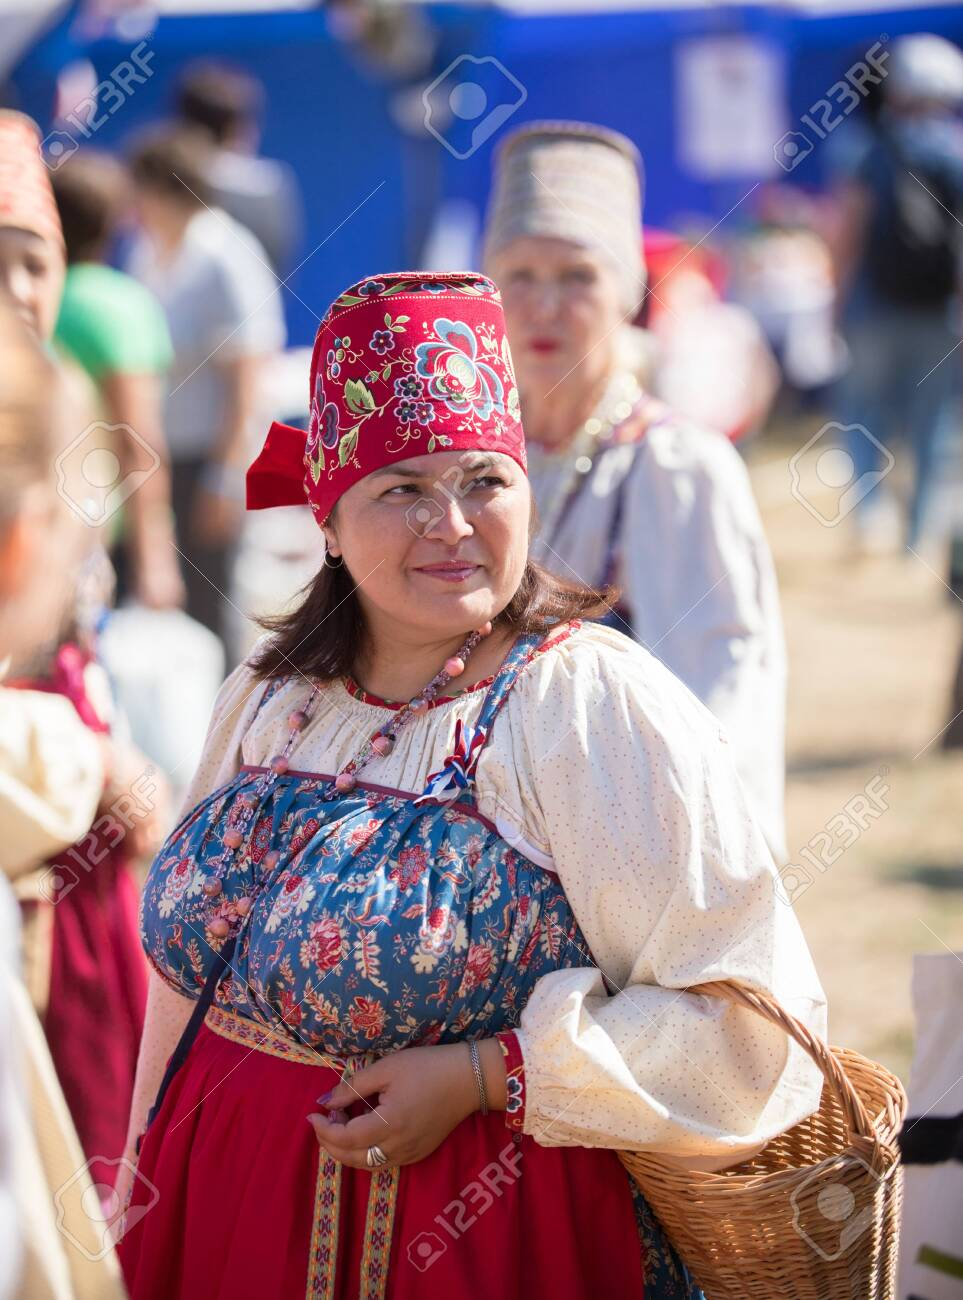 Mature women videos russian Sofia Vergara